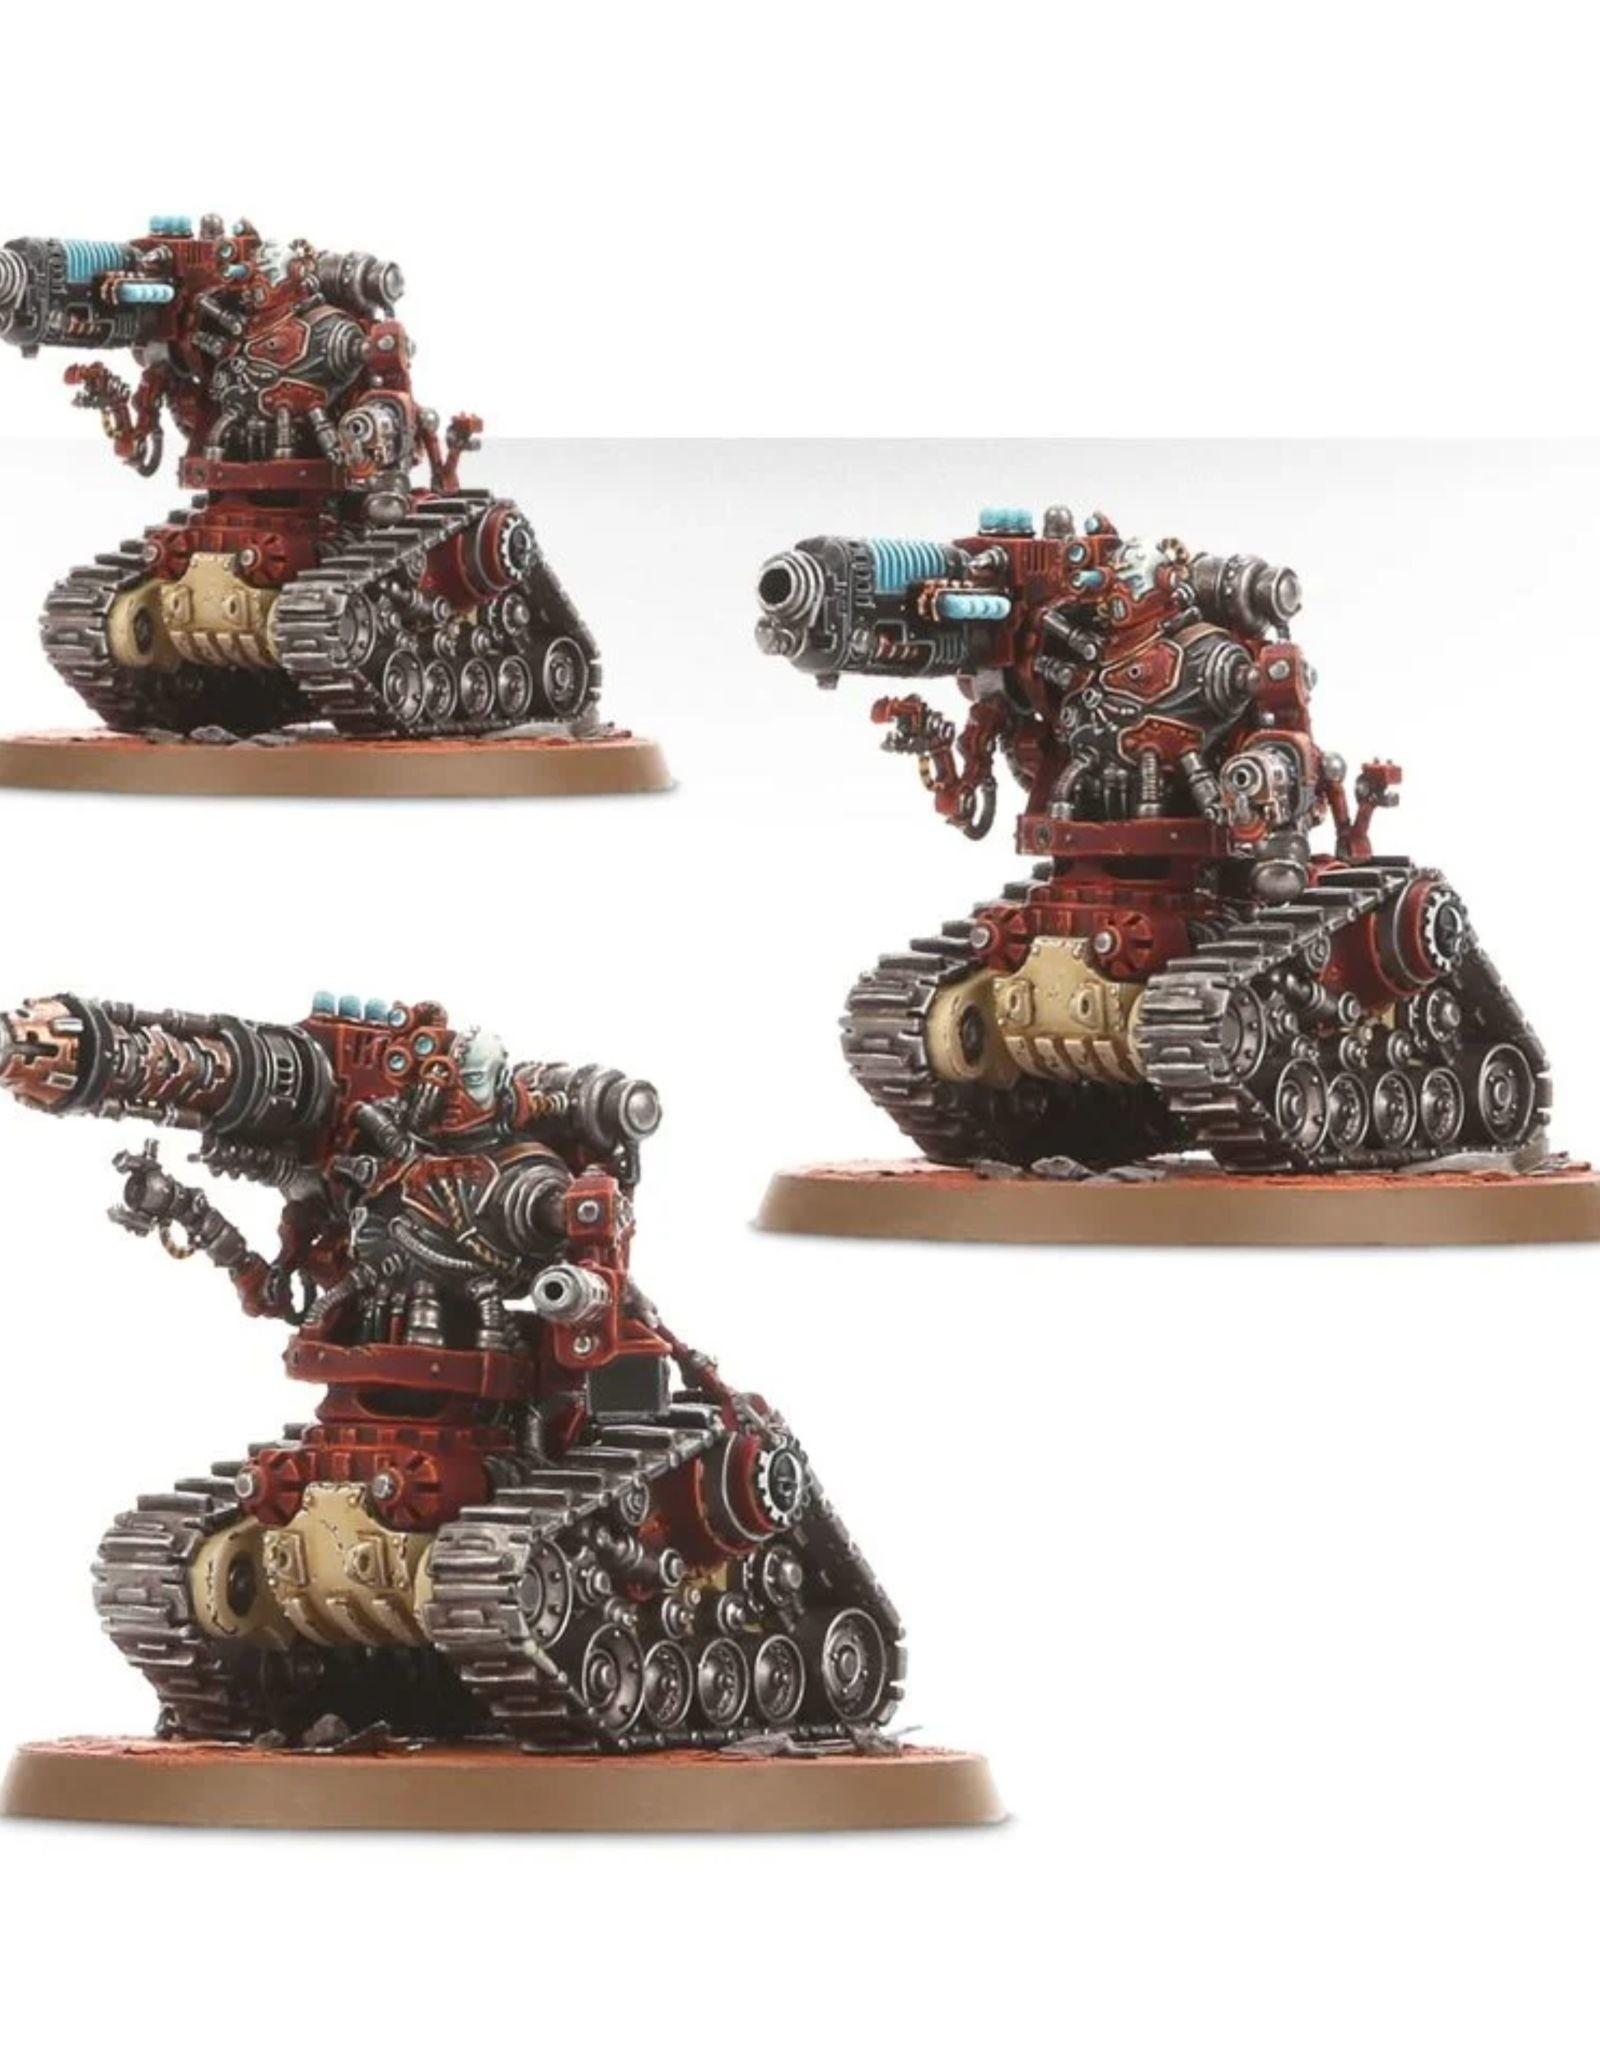 Warhammer 40k Adeptus Mechanicus - Kataphron Battle Servitors